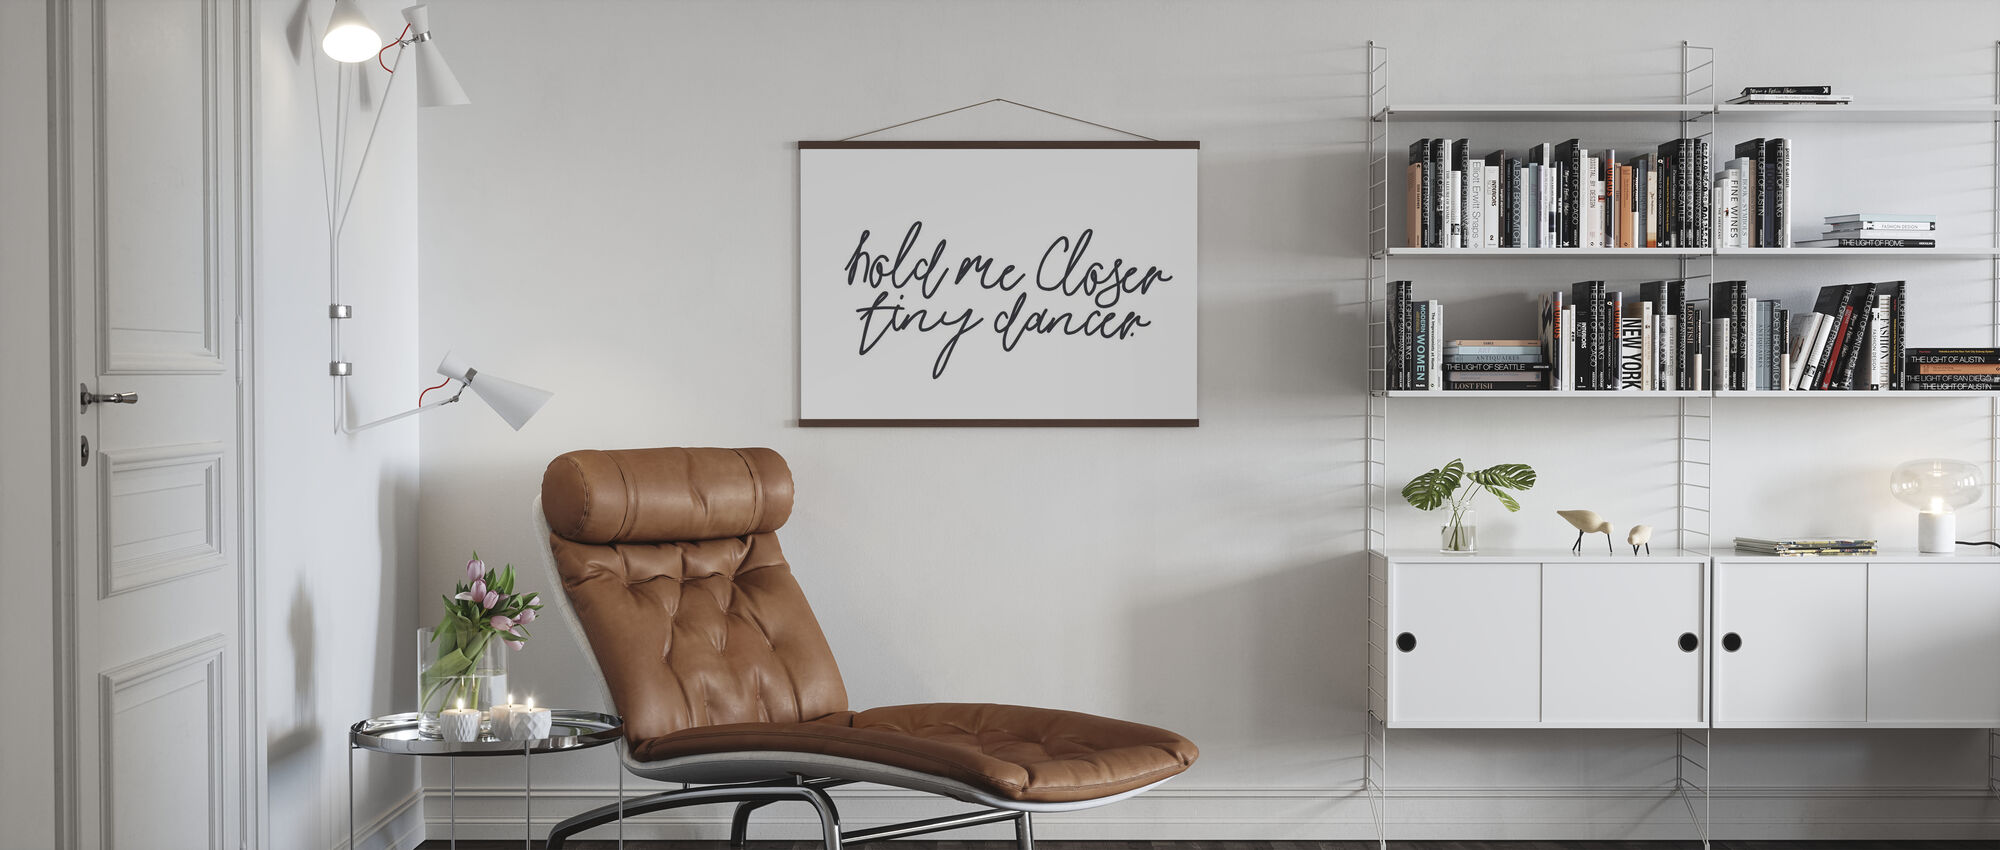 Hold Me Closer Tiny Dancer - Poster - Living Room